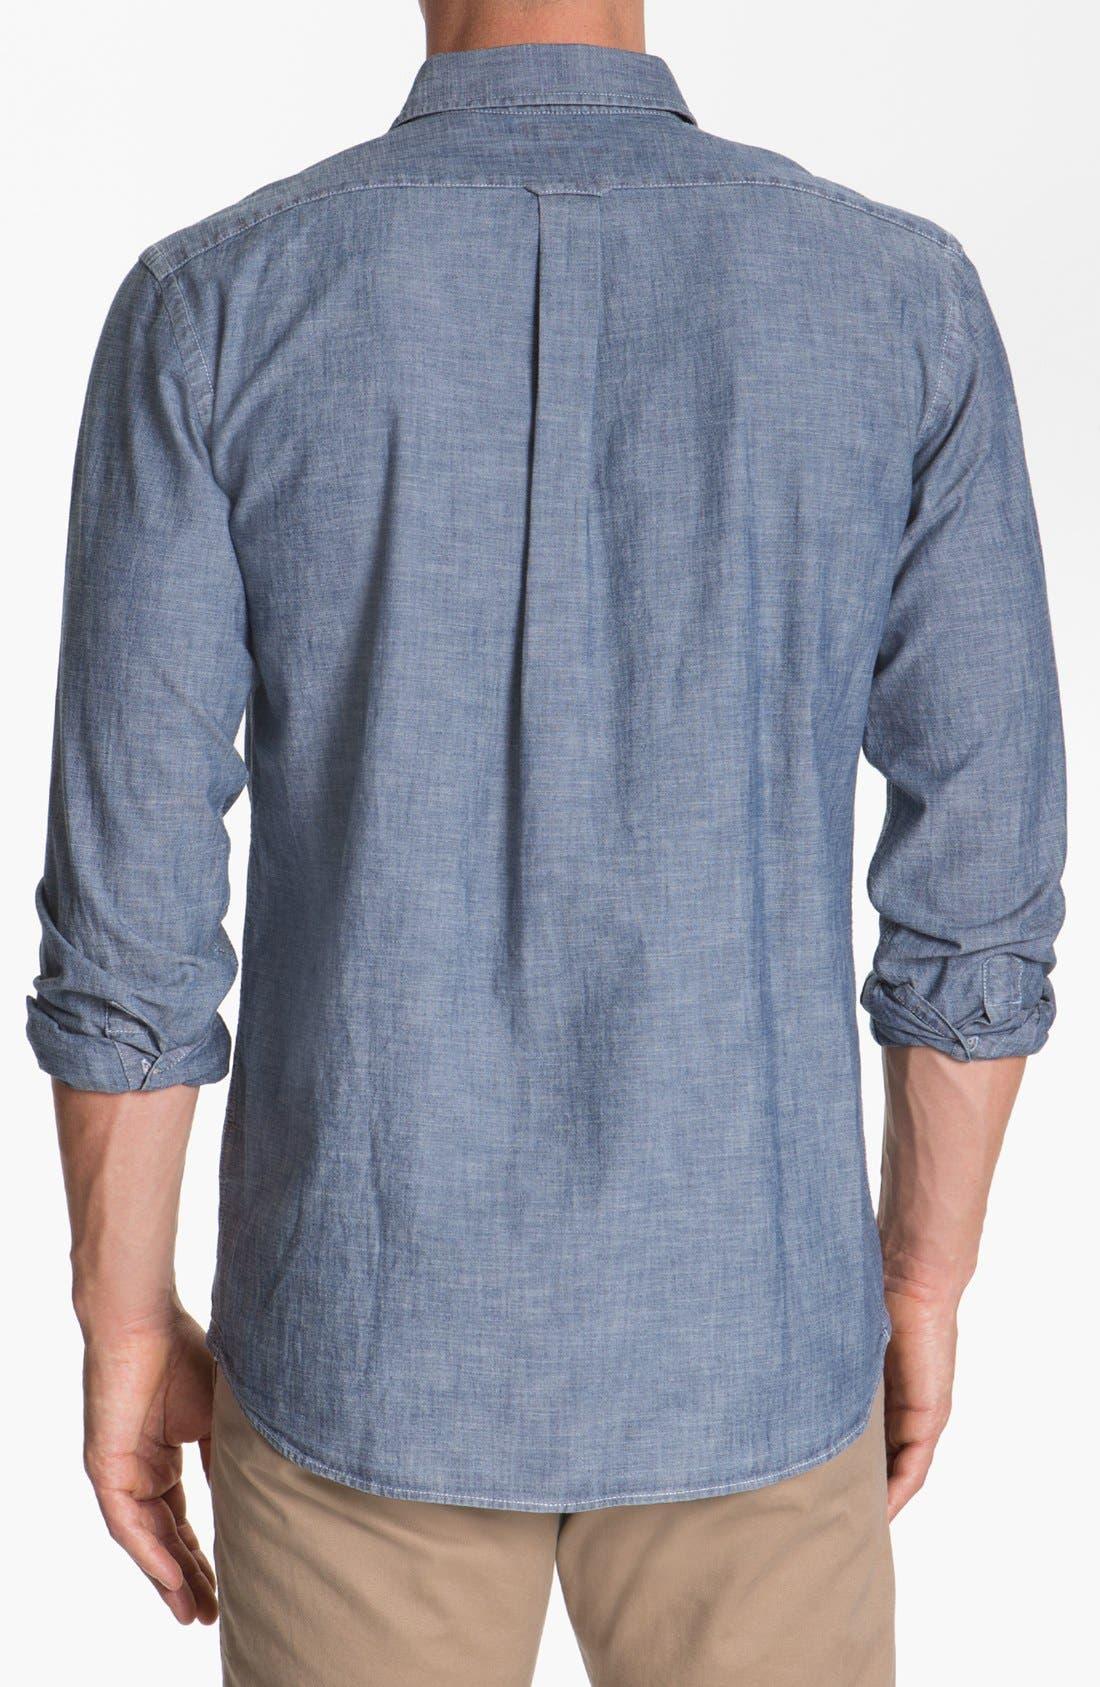 Alternate Image 2  - Façonnable Tailored Denim Regular Fit Chambray Sport Shirt